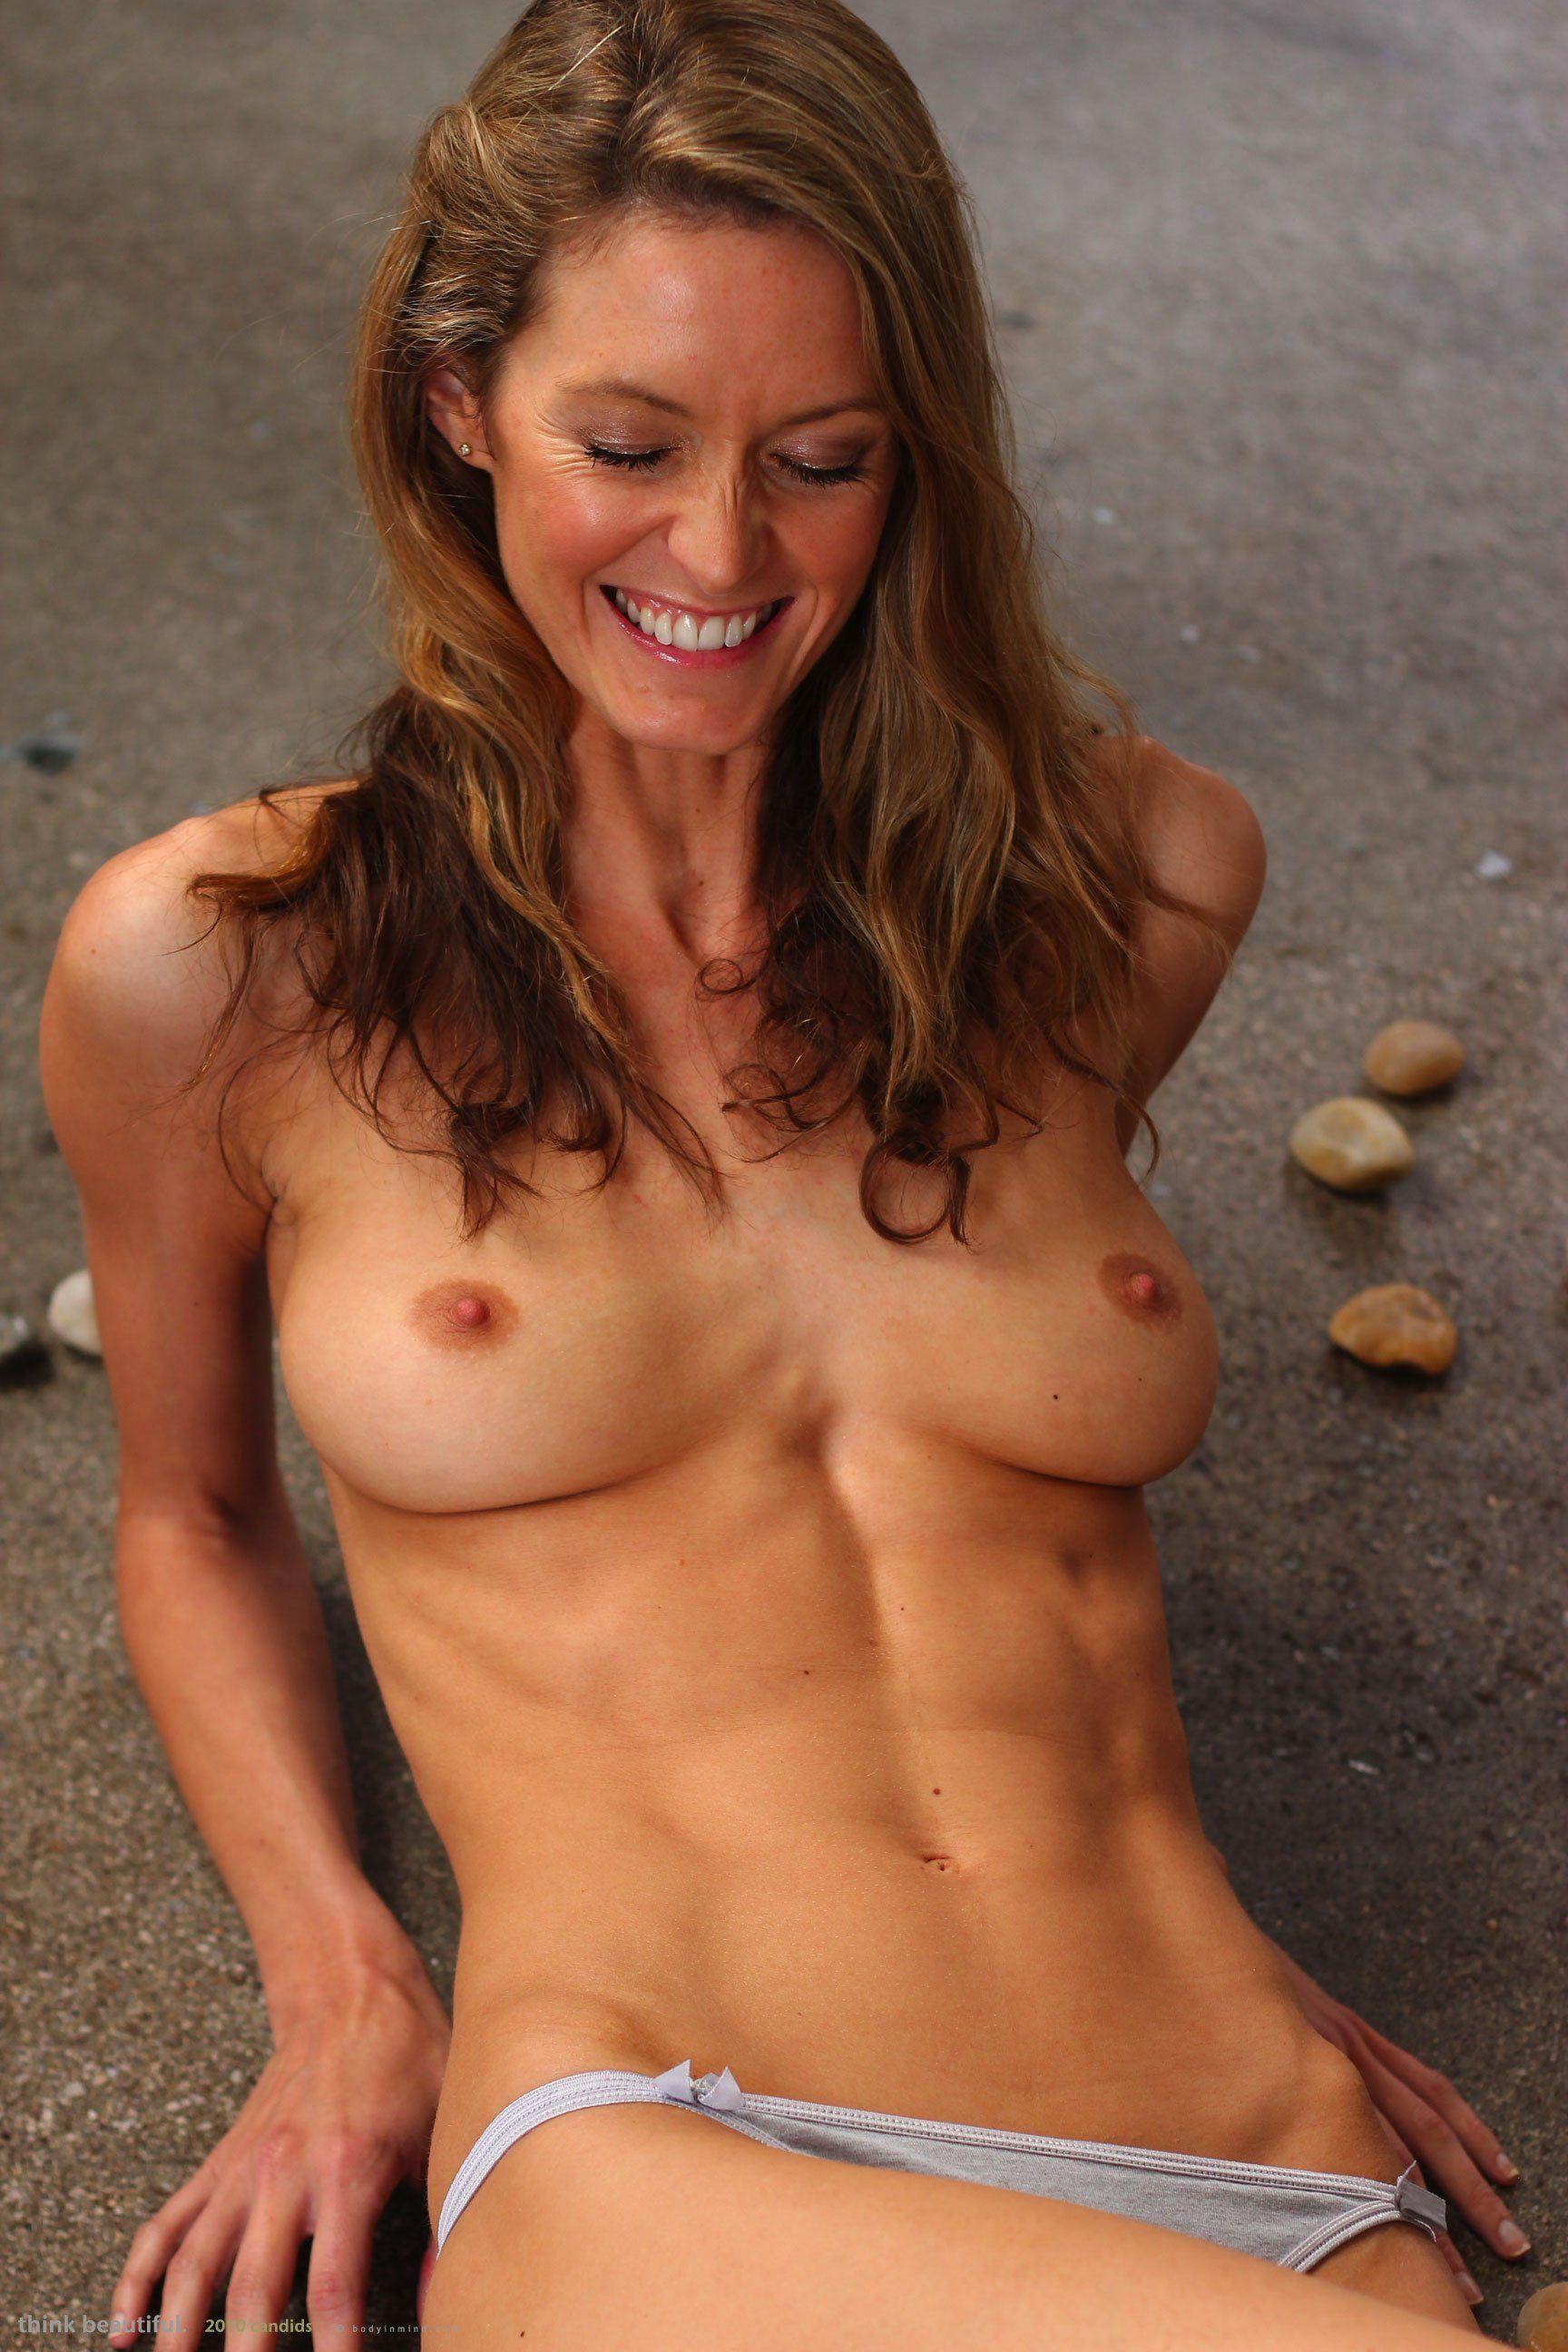 Flat stomach nude women Beautiful Nude Flat Stomach Women Trends Porno Free Gallery